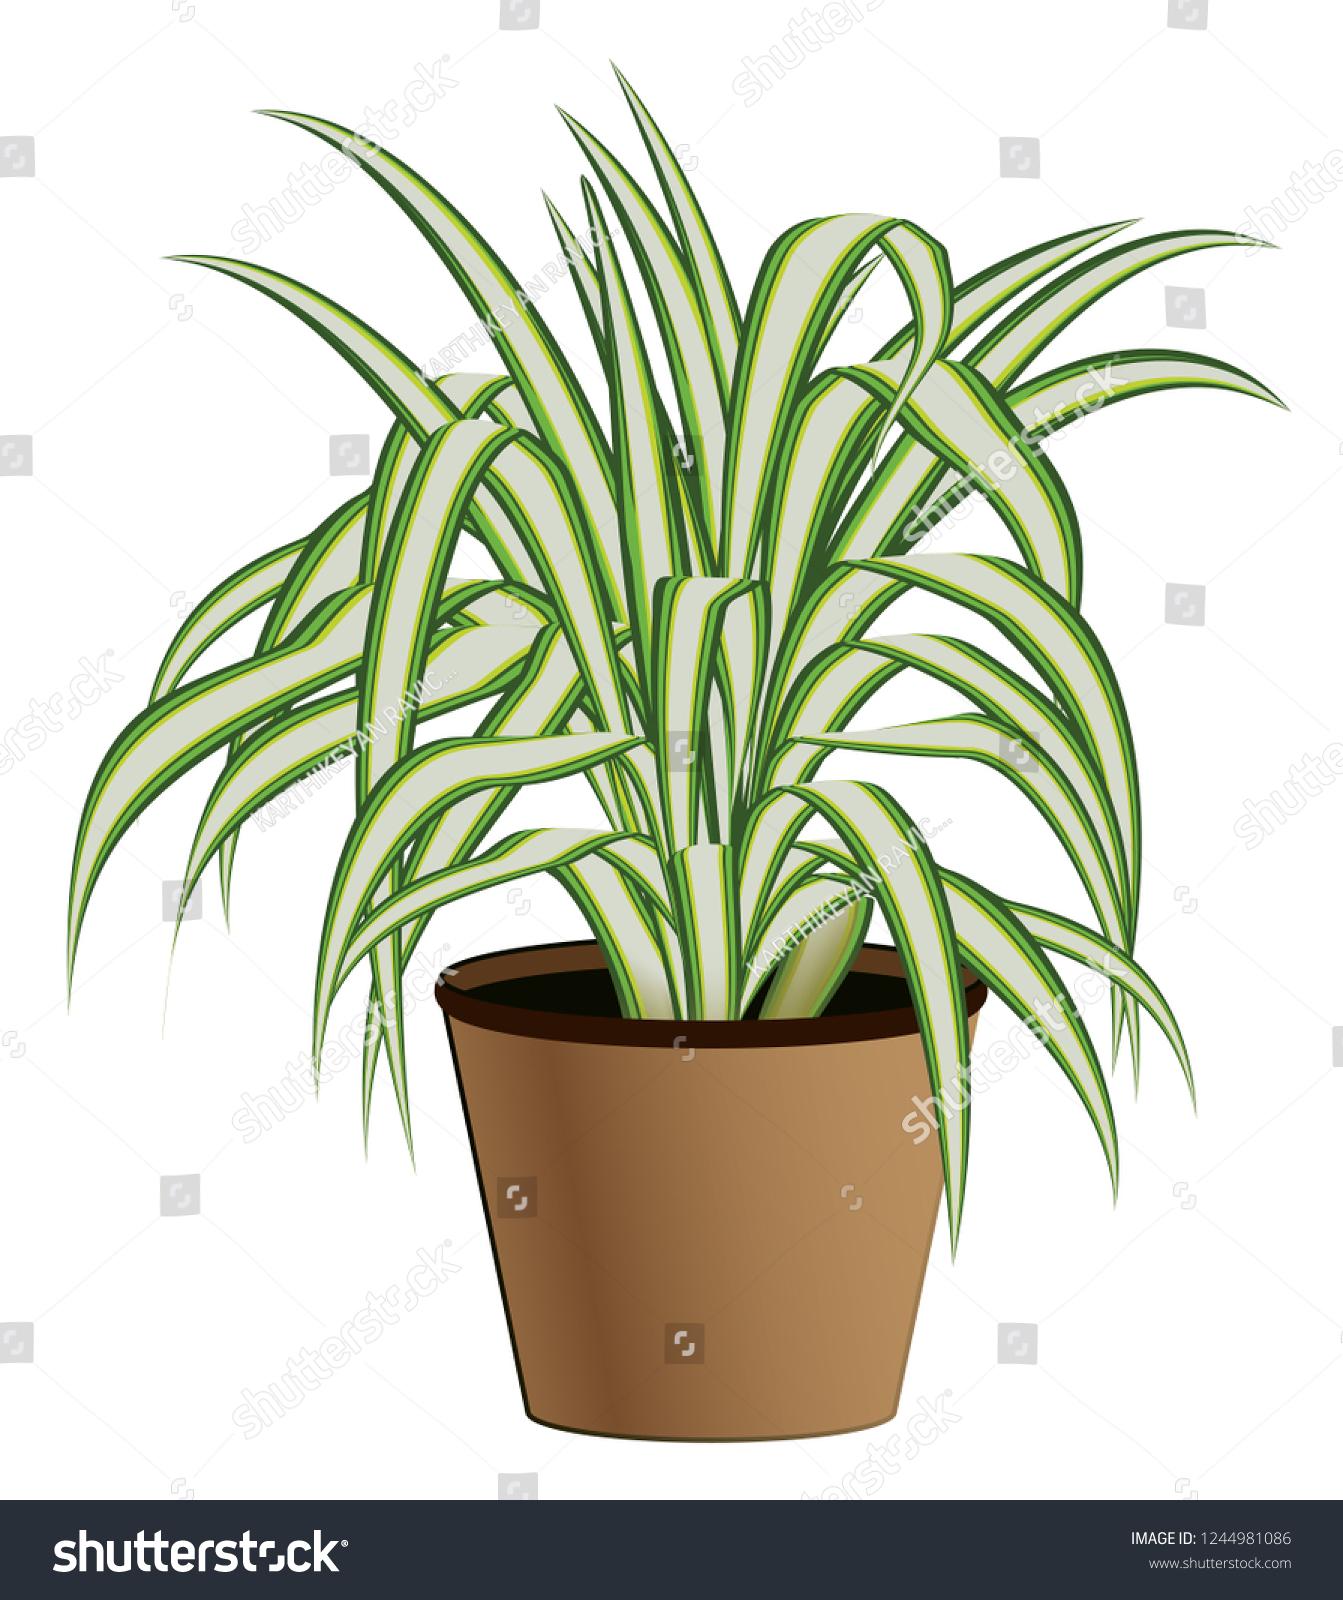 Chlorophytum Spider Plant Vector Illustration Stock Vector Royalty Free 1244981086